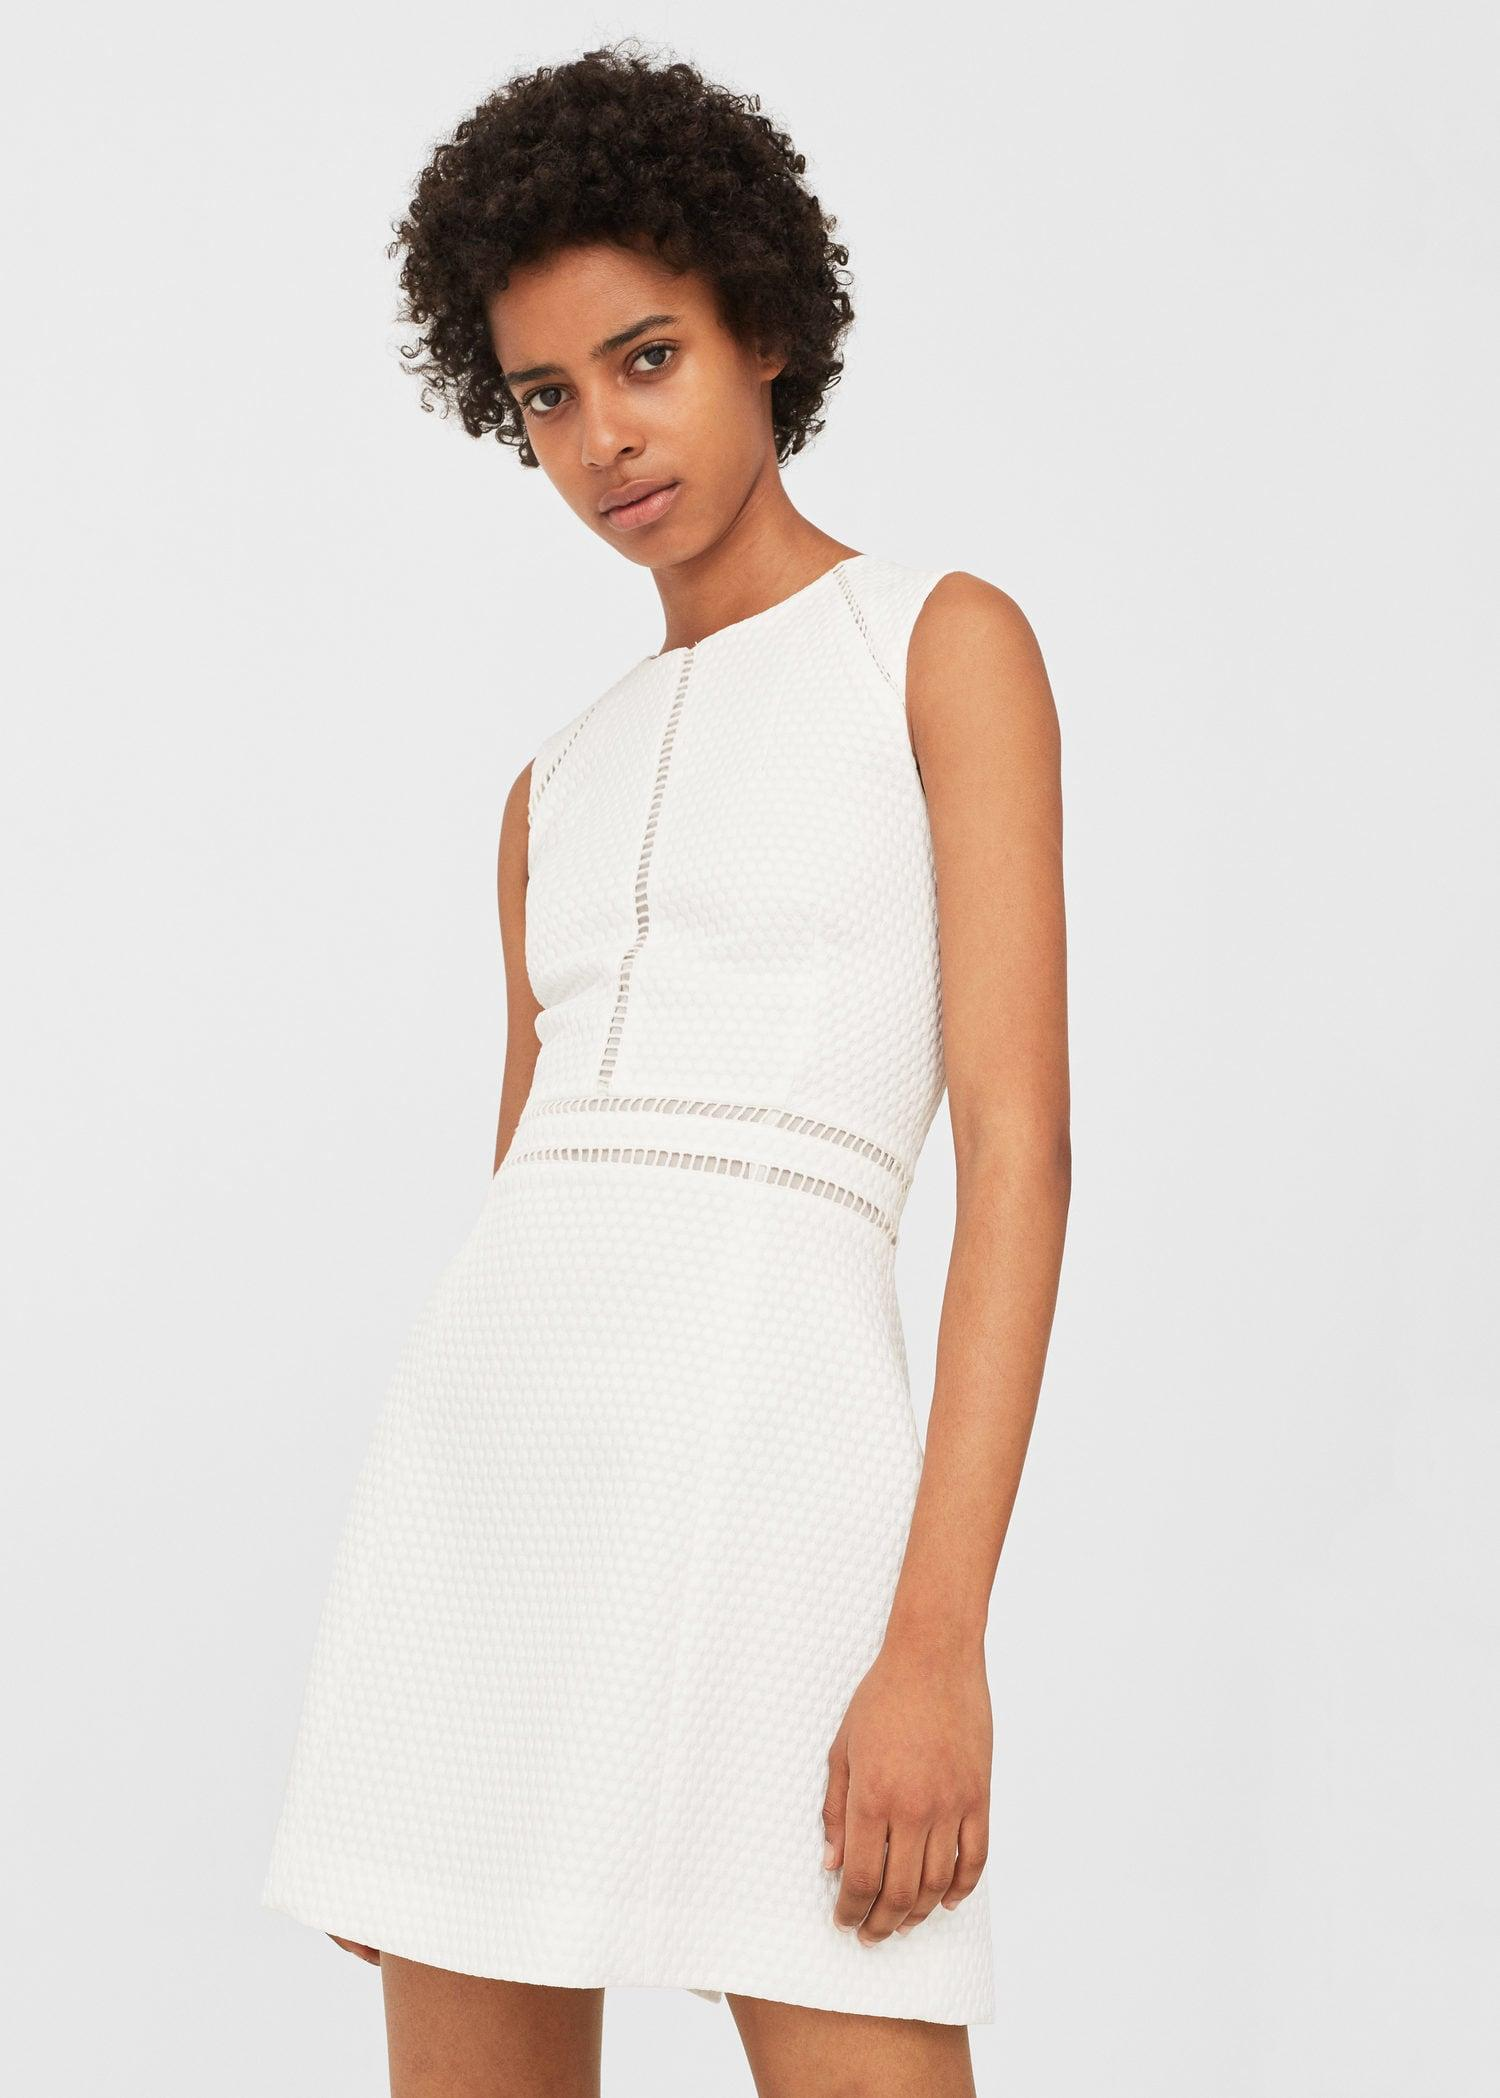 Mango Open-work Trim Dress in White